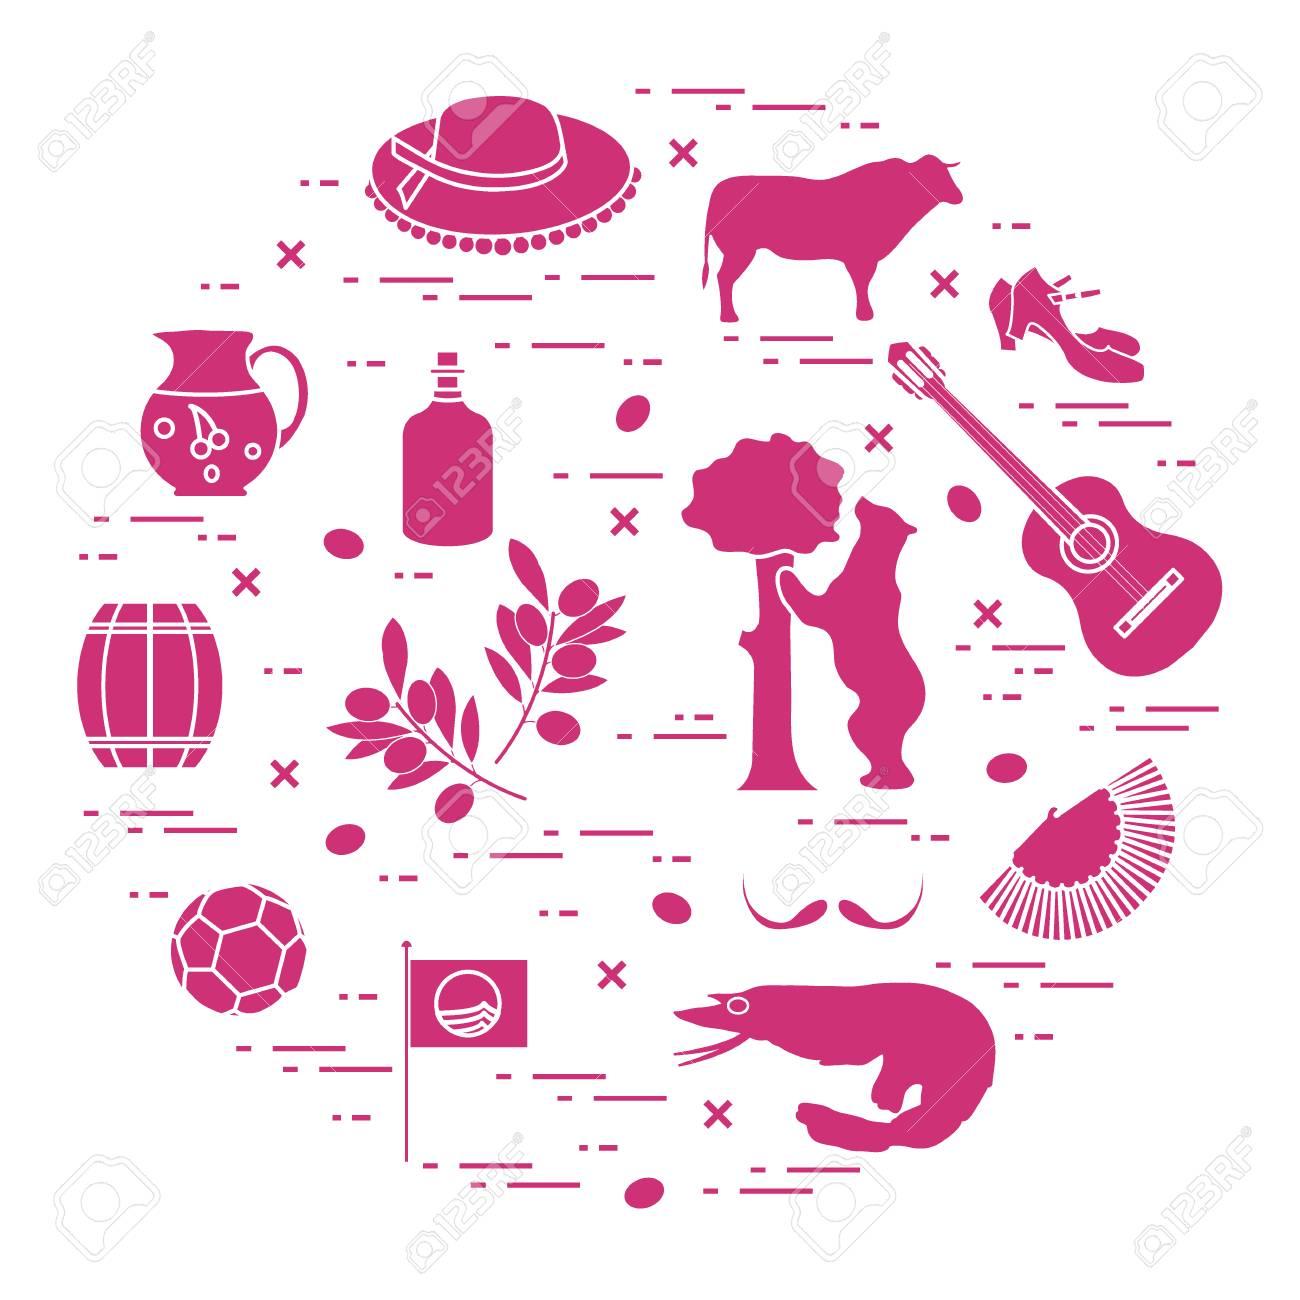 Vector illustration with various symbols of spain arranged in vector illustration with various symbols of spain arranged in a circle travel and leisure buycottarizona